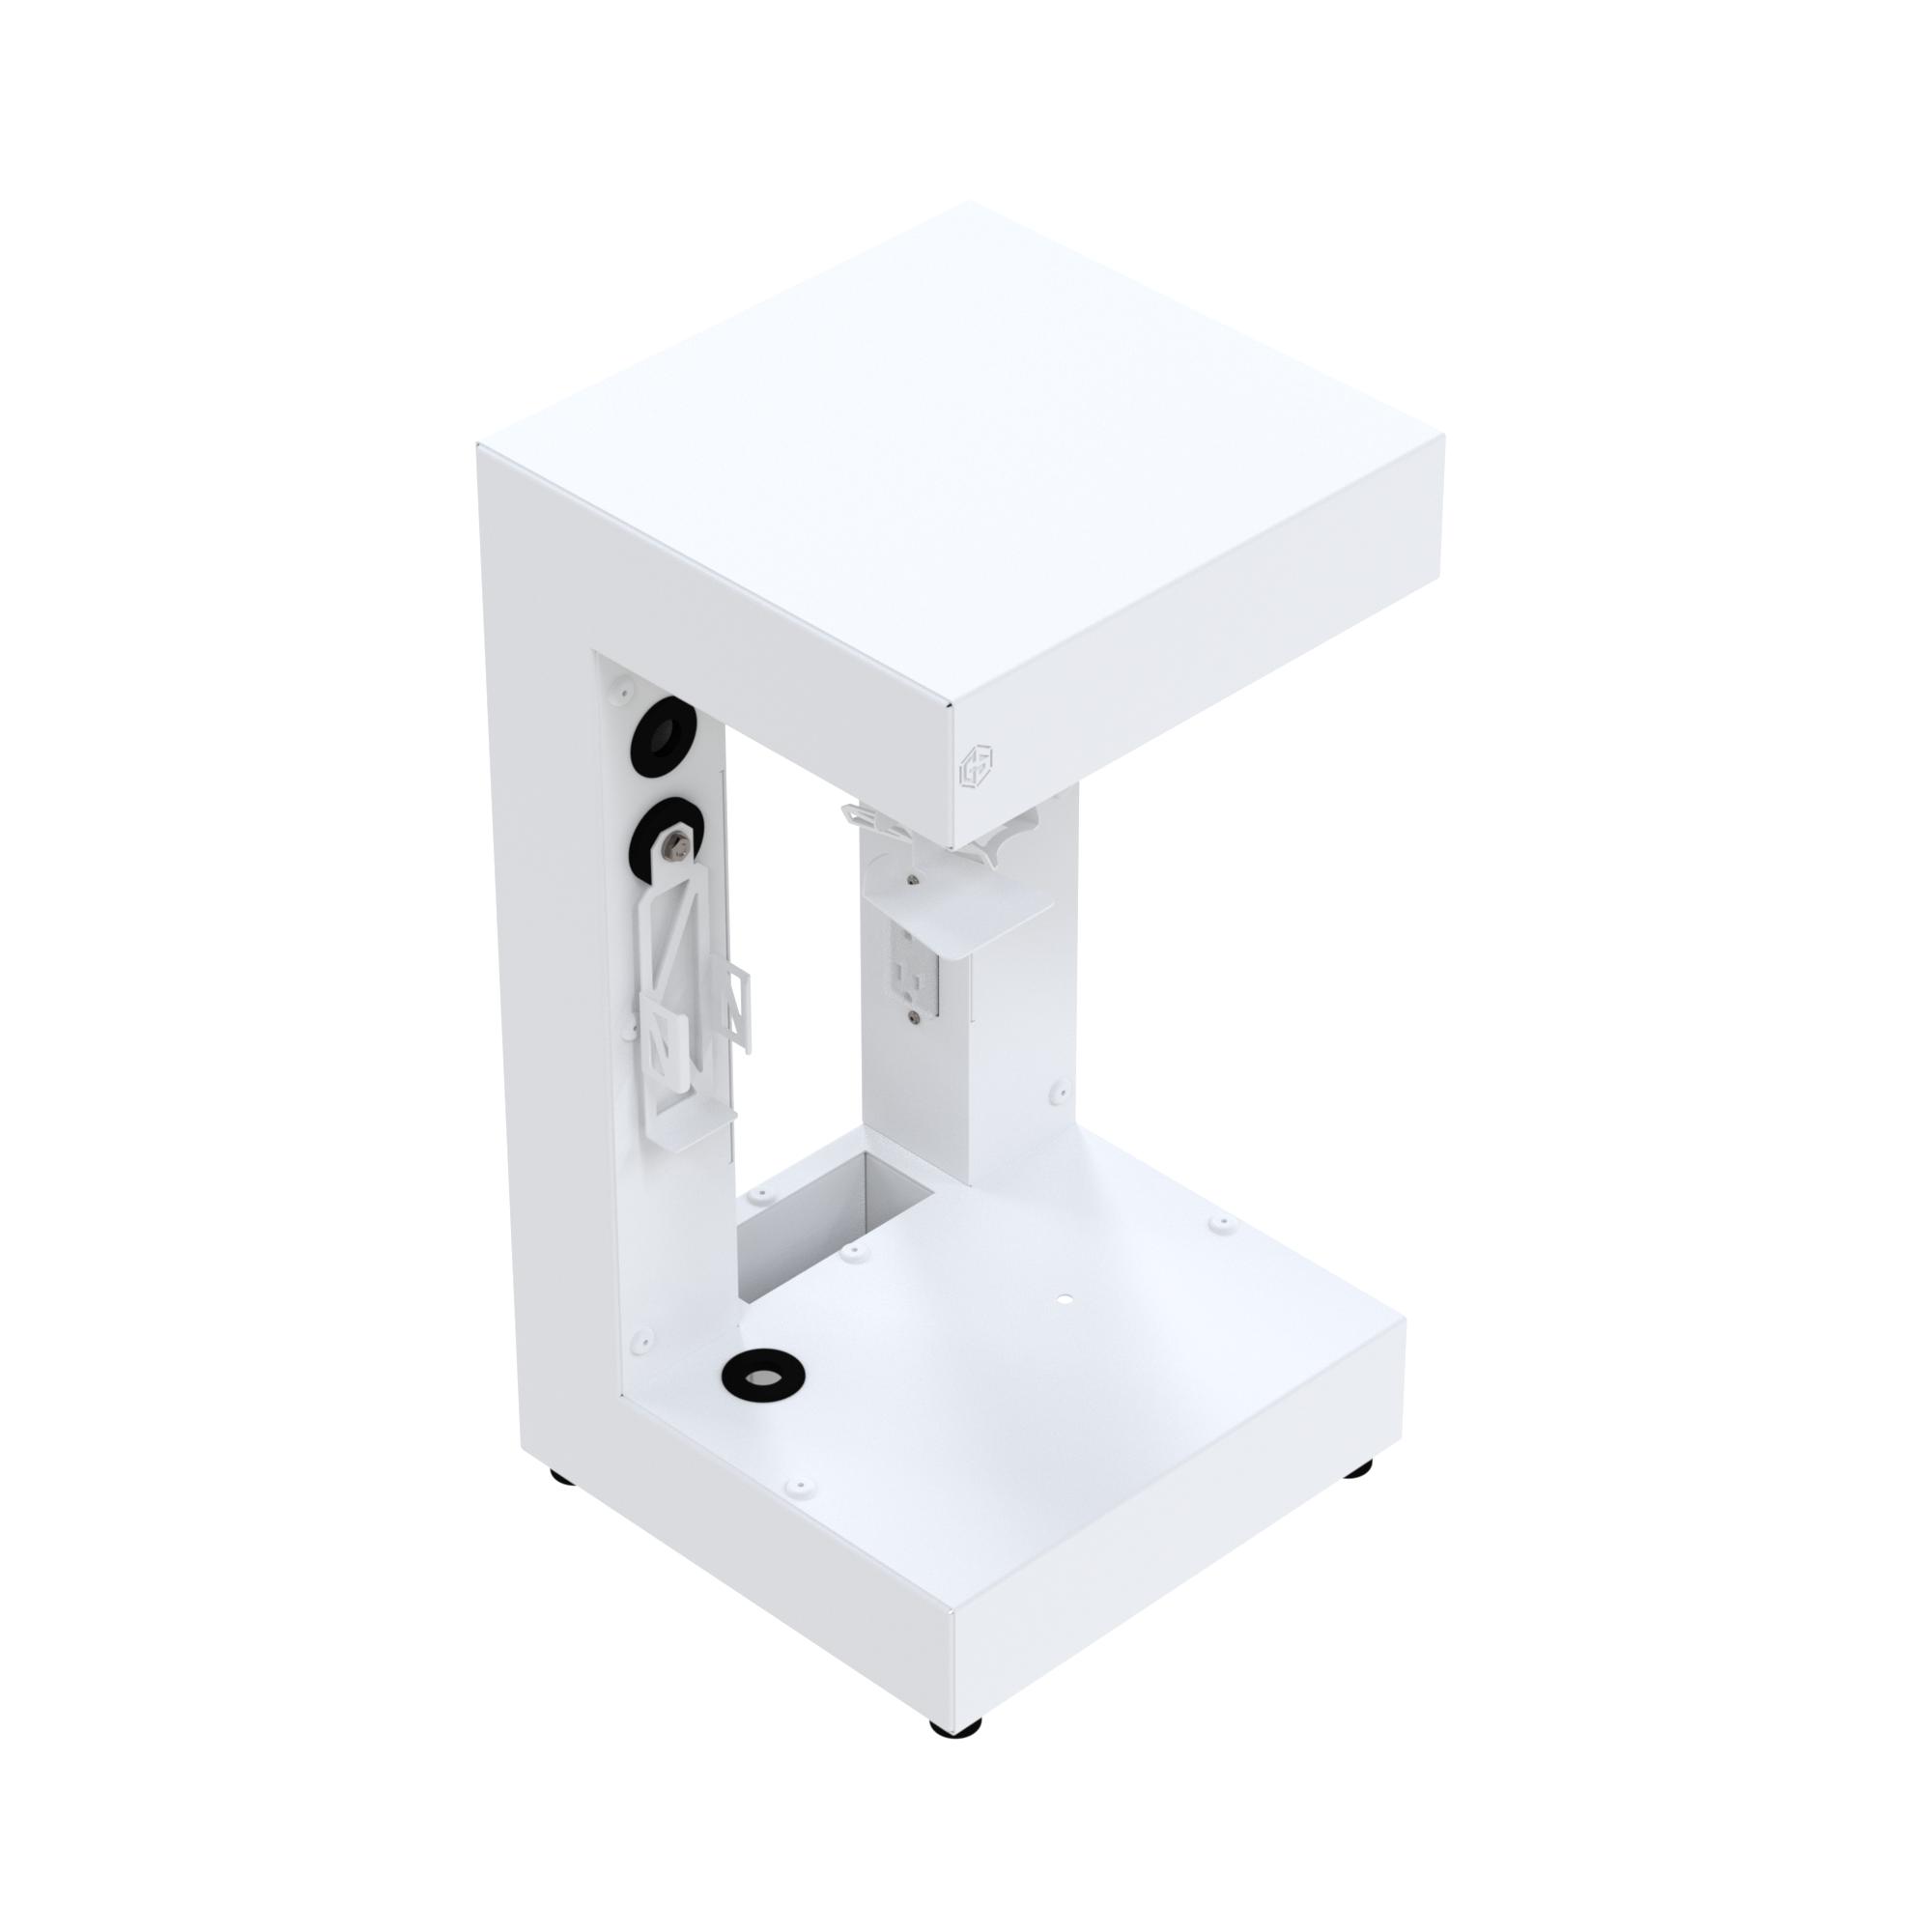 White GameCaddy Basic_Camera_View 7 -ISO2